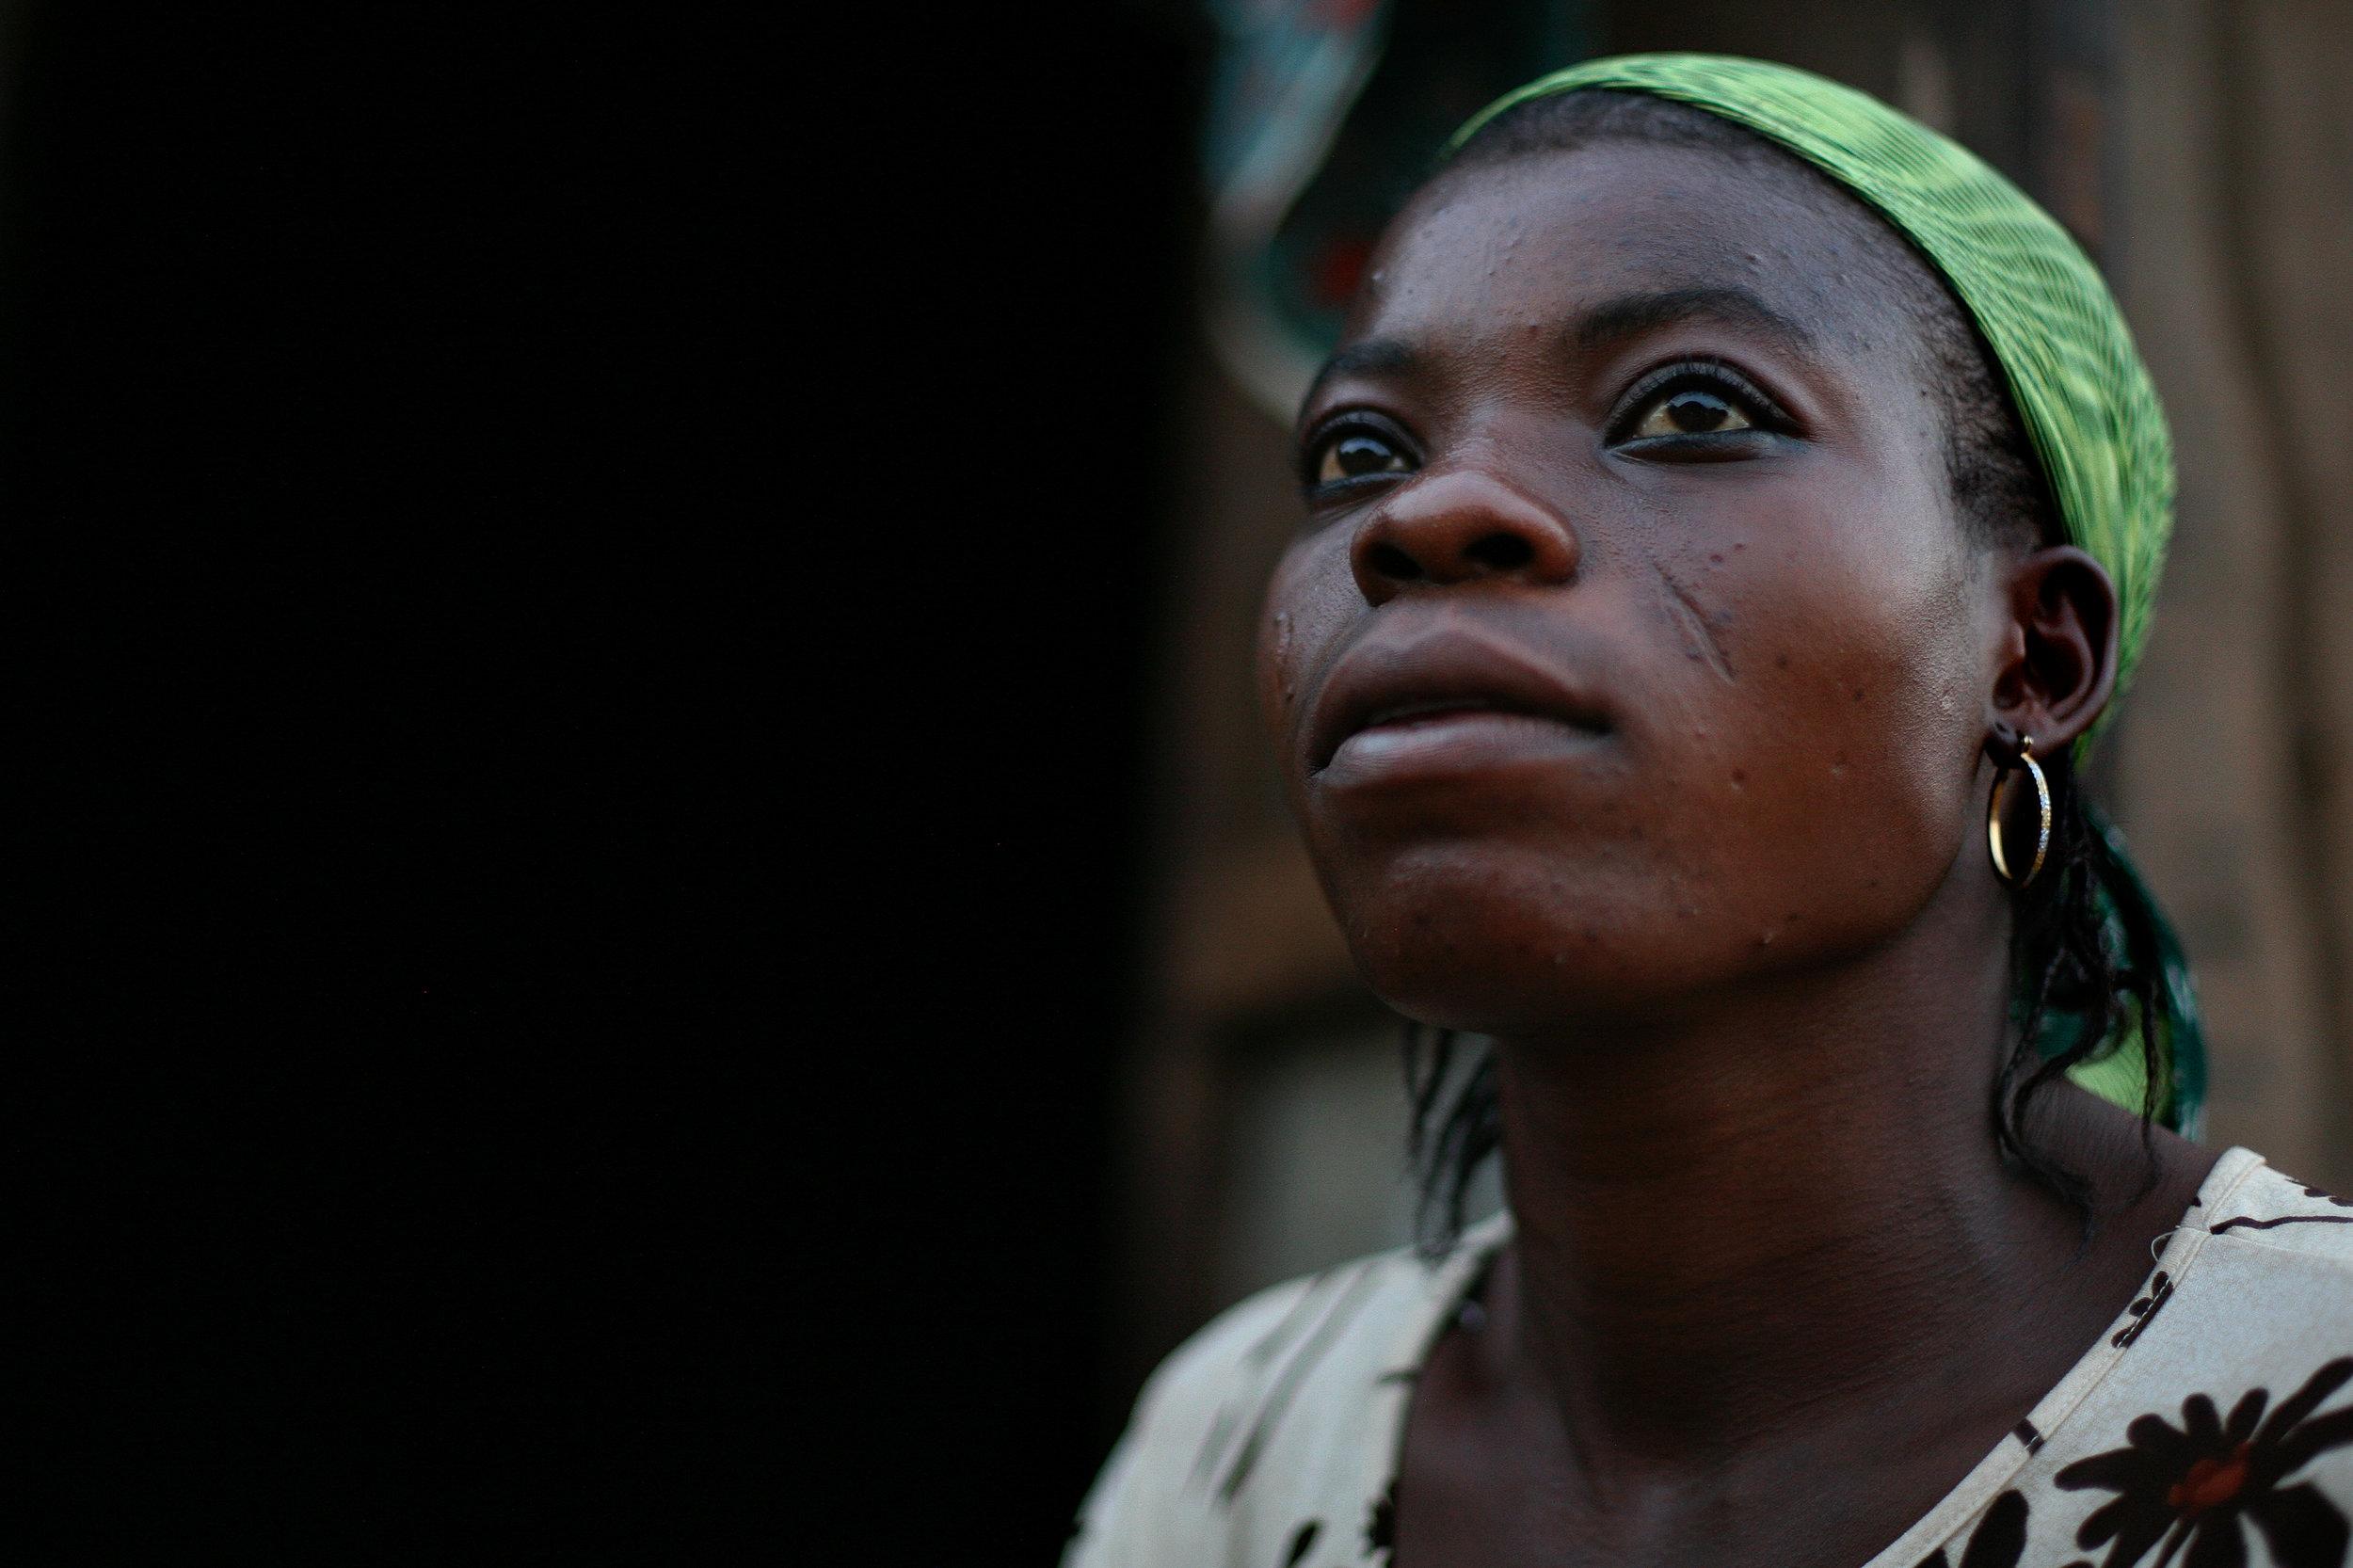 Amariya, in Tampion, Ghana on March 26, 2009.